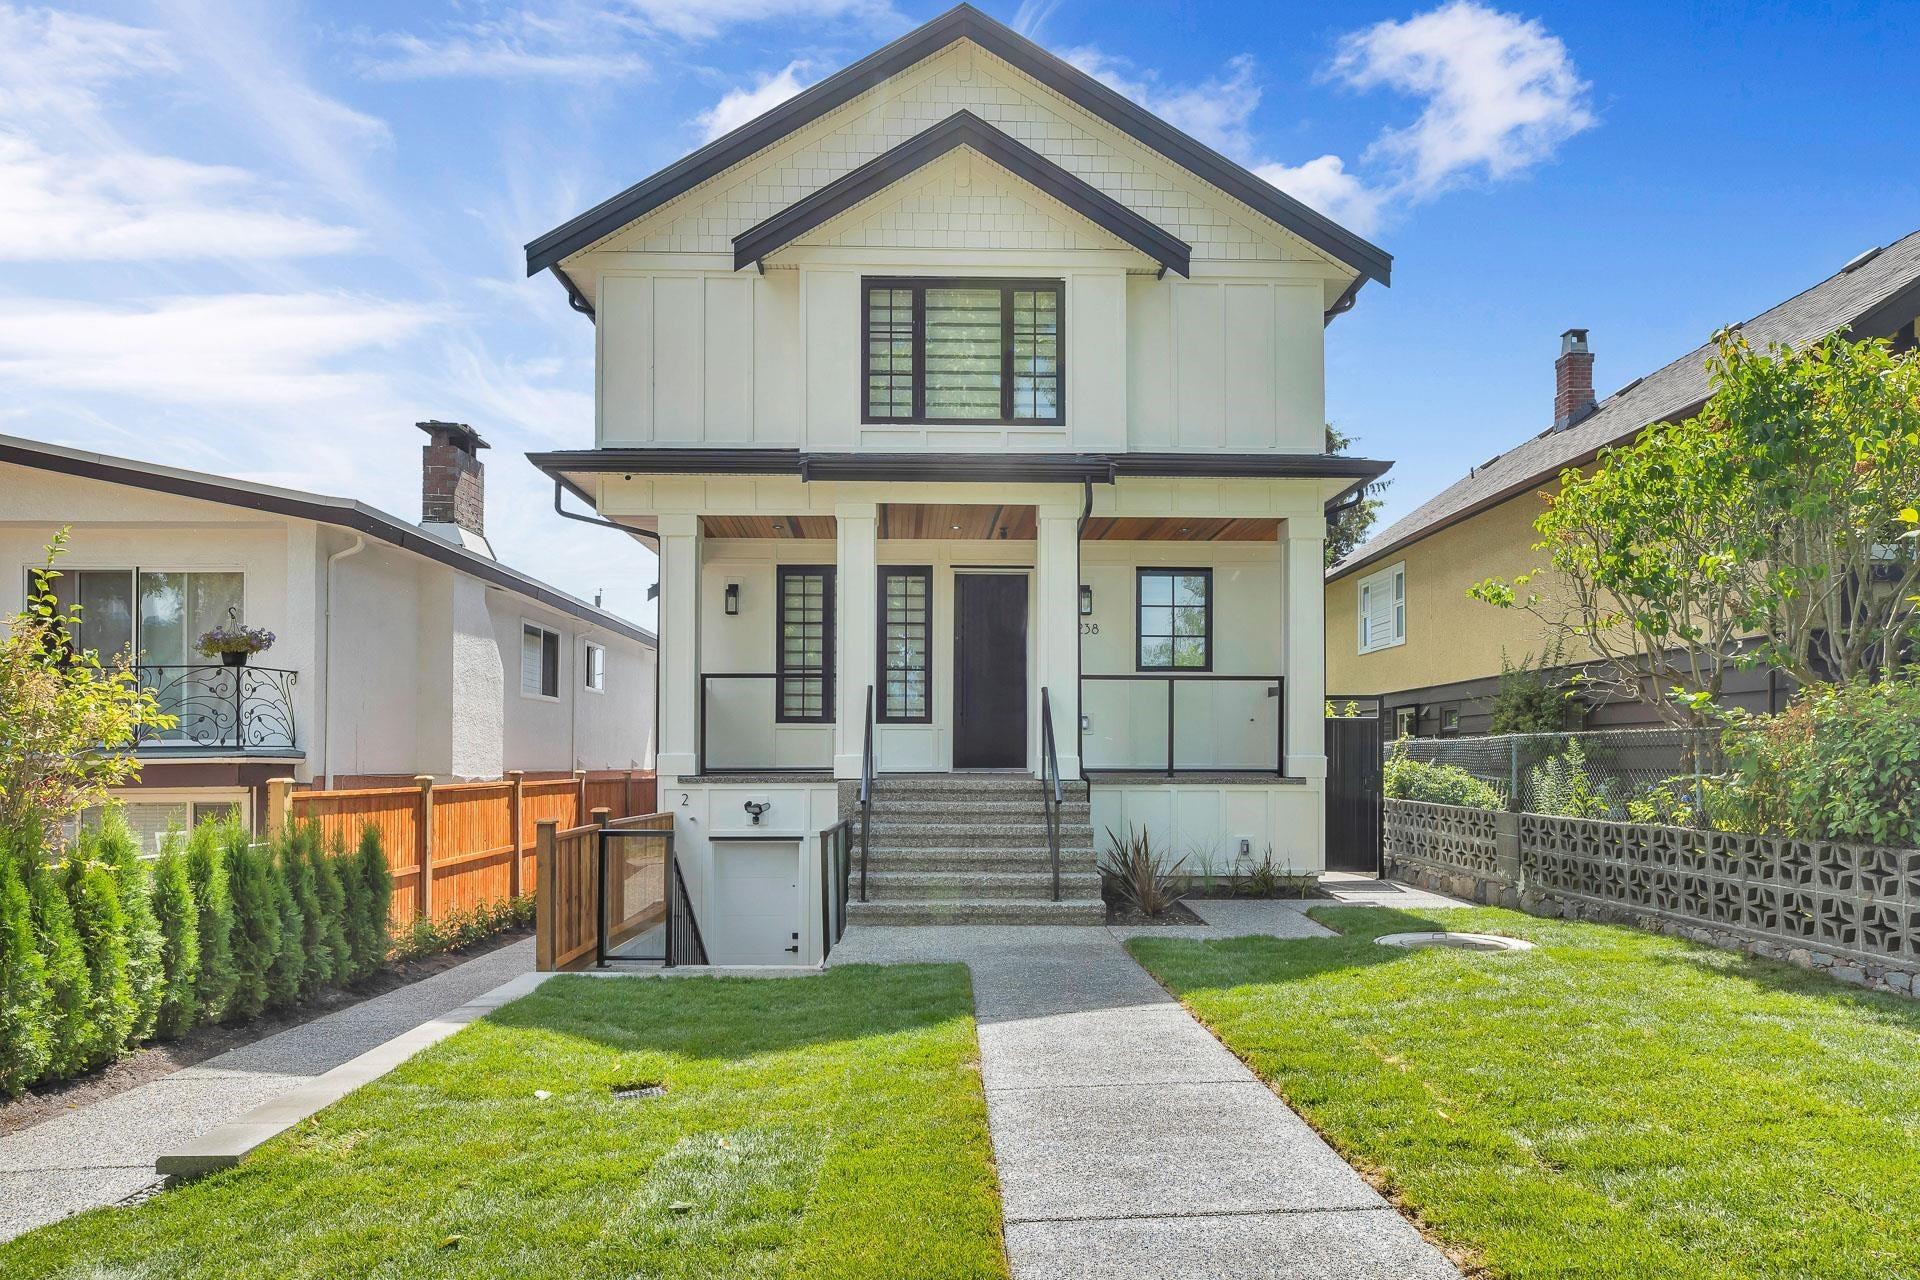 3238 E PENDER STREET - Renfrew VE 1/2 Duplex for sale, 5 Bedrooms (R2608856) - #1